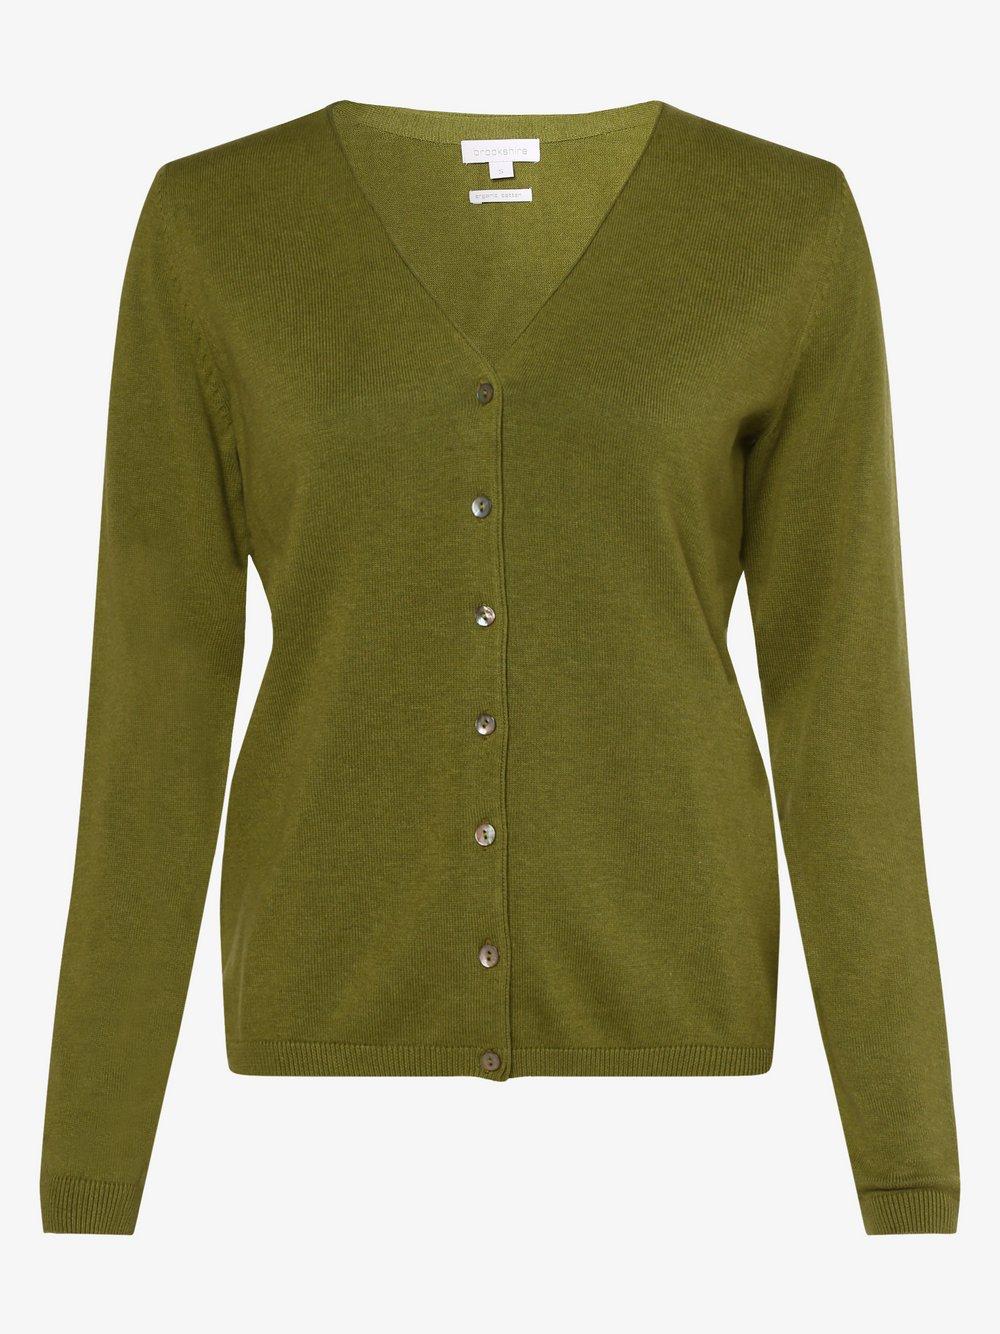 brookshire - Kardigan damski, zielony